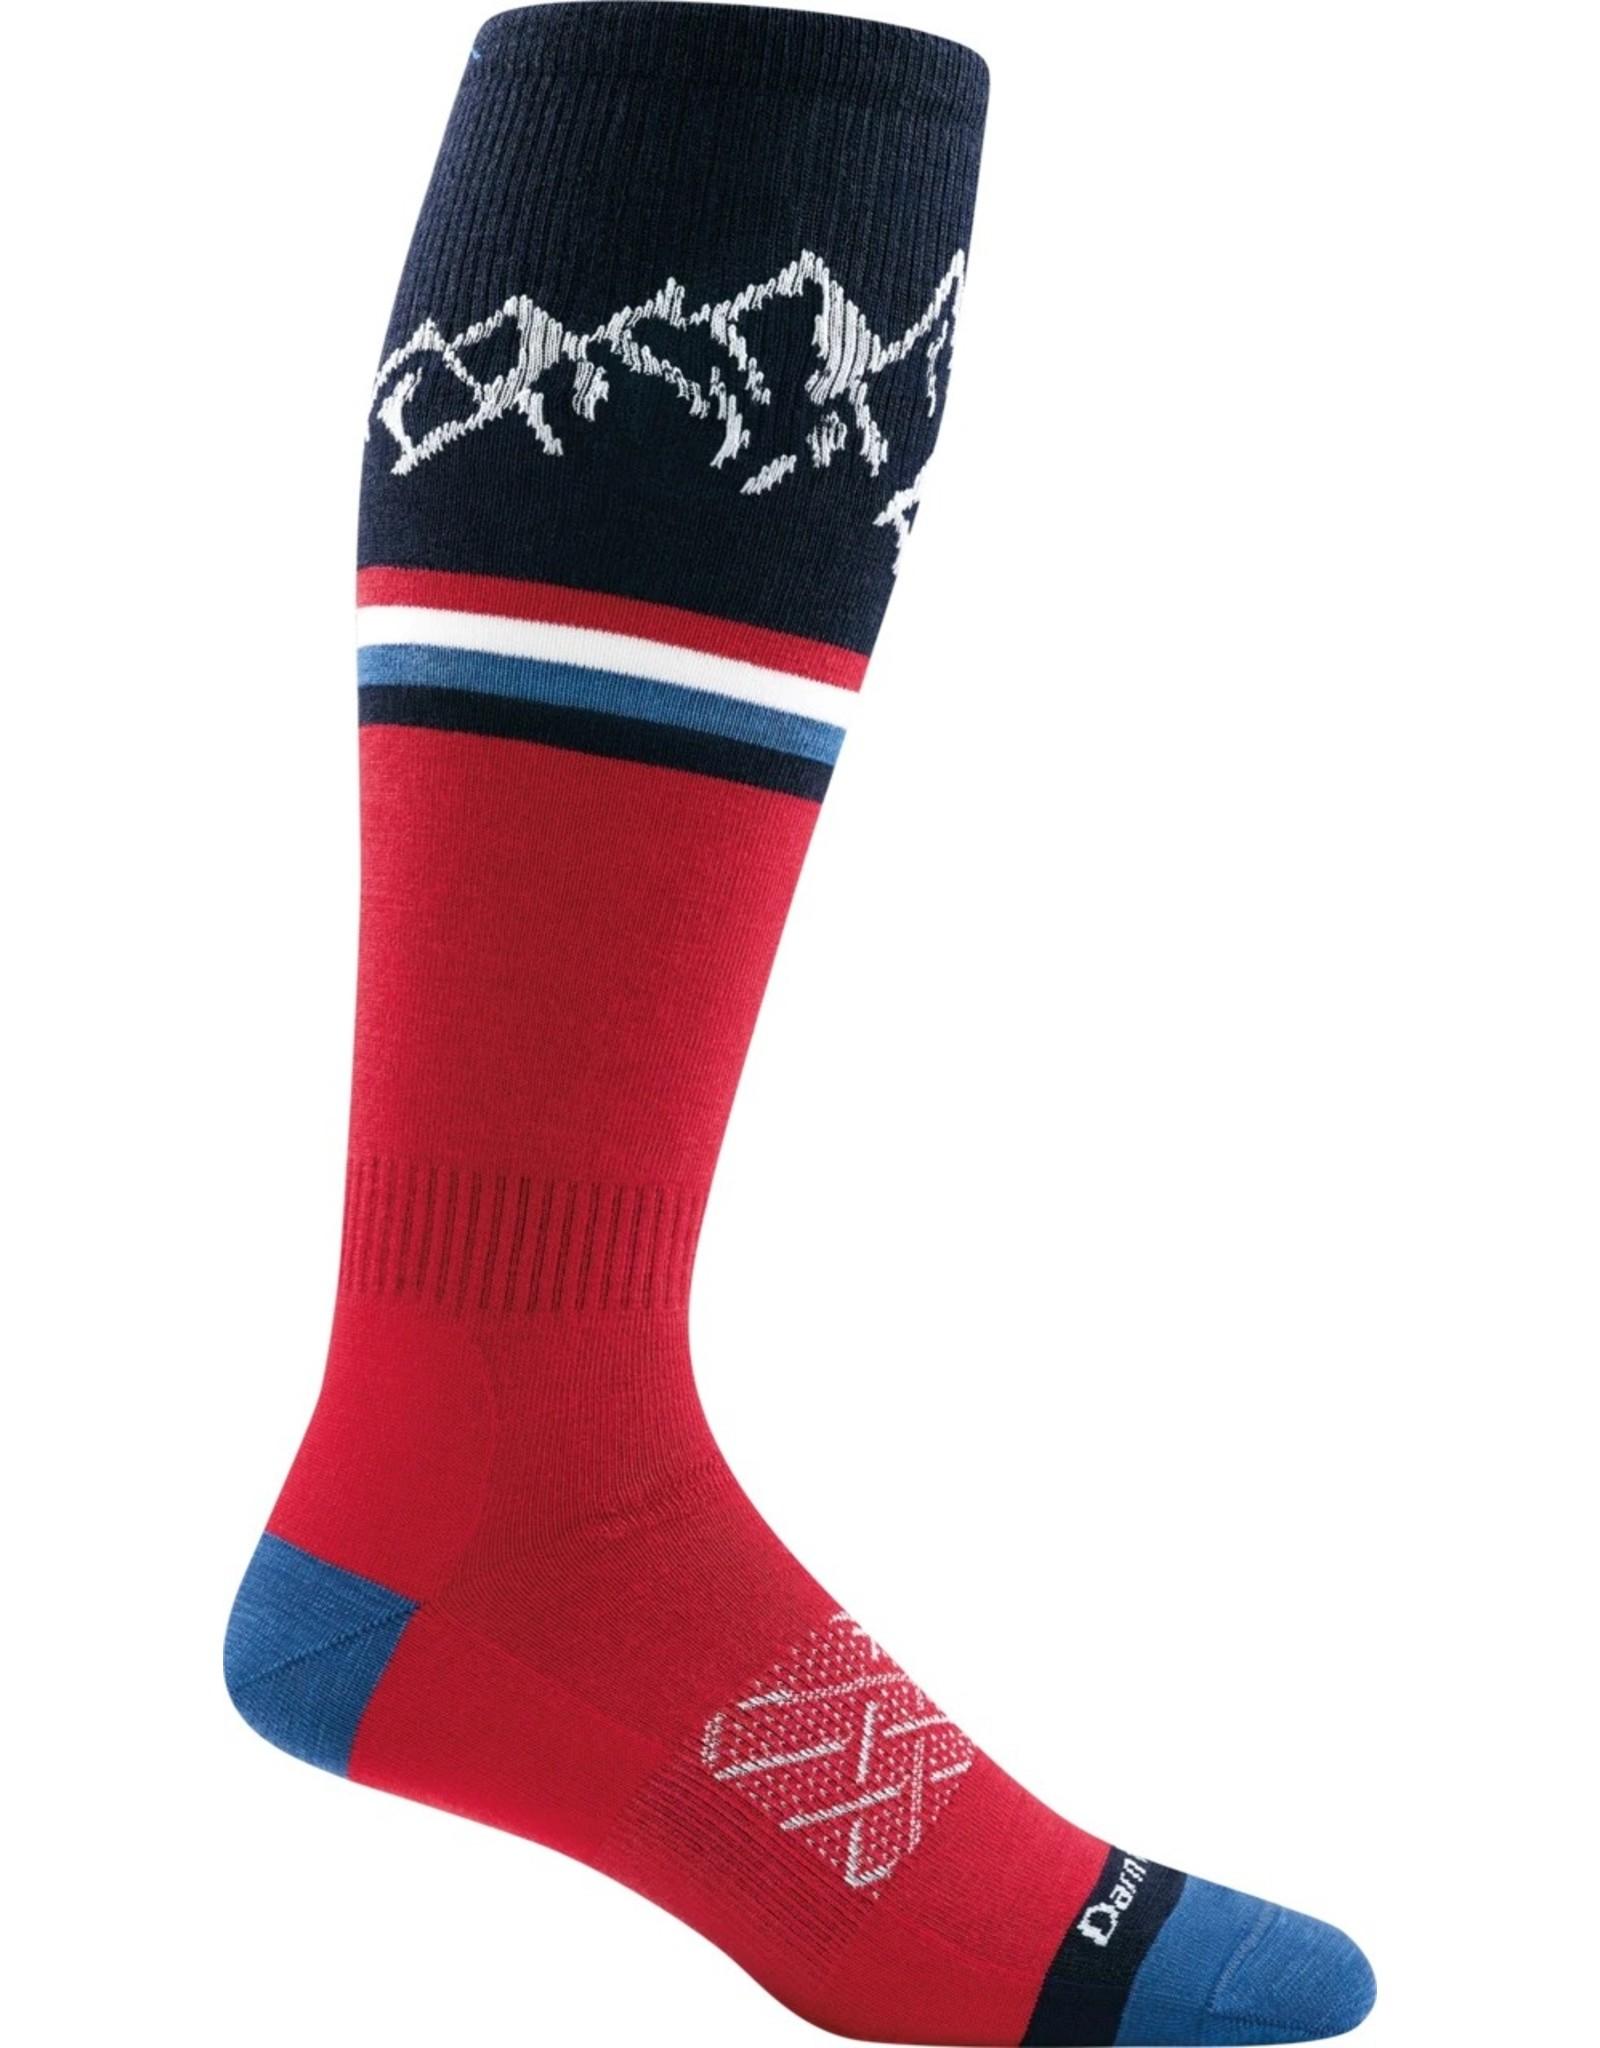 Darn Tough Darn Tough Alpenglow OTC Lightweight Men's Socks